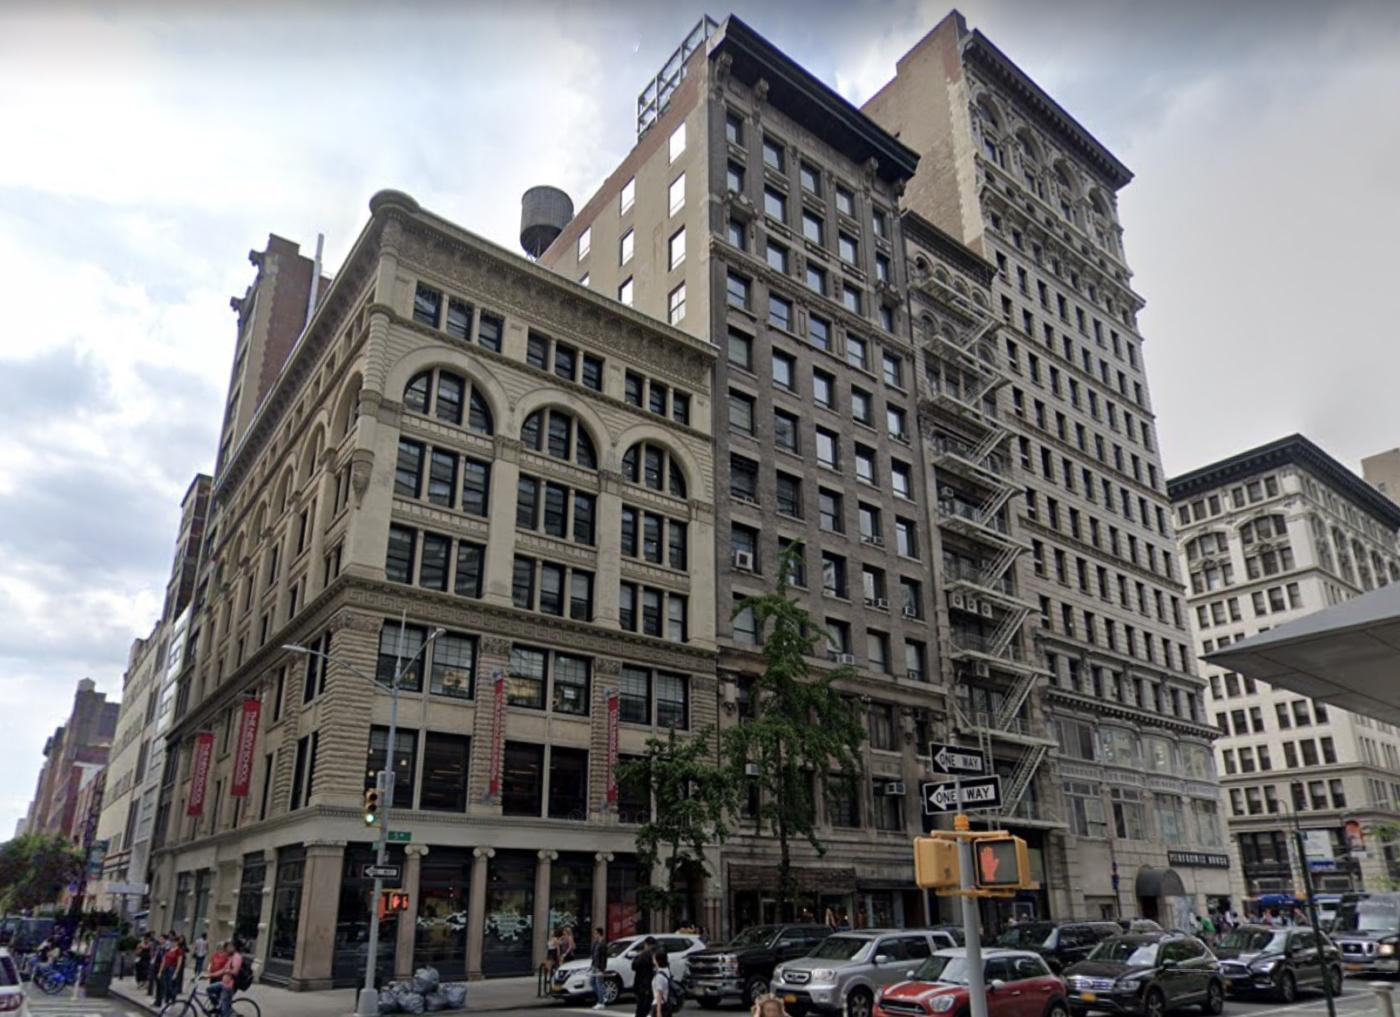 72, 74-76, 78, 80 Fifth Avenue